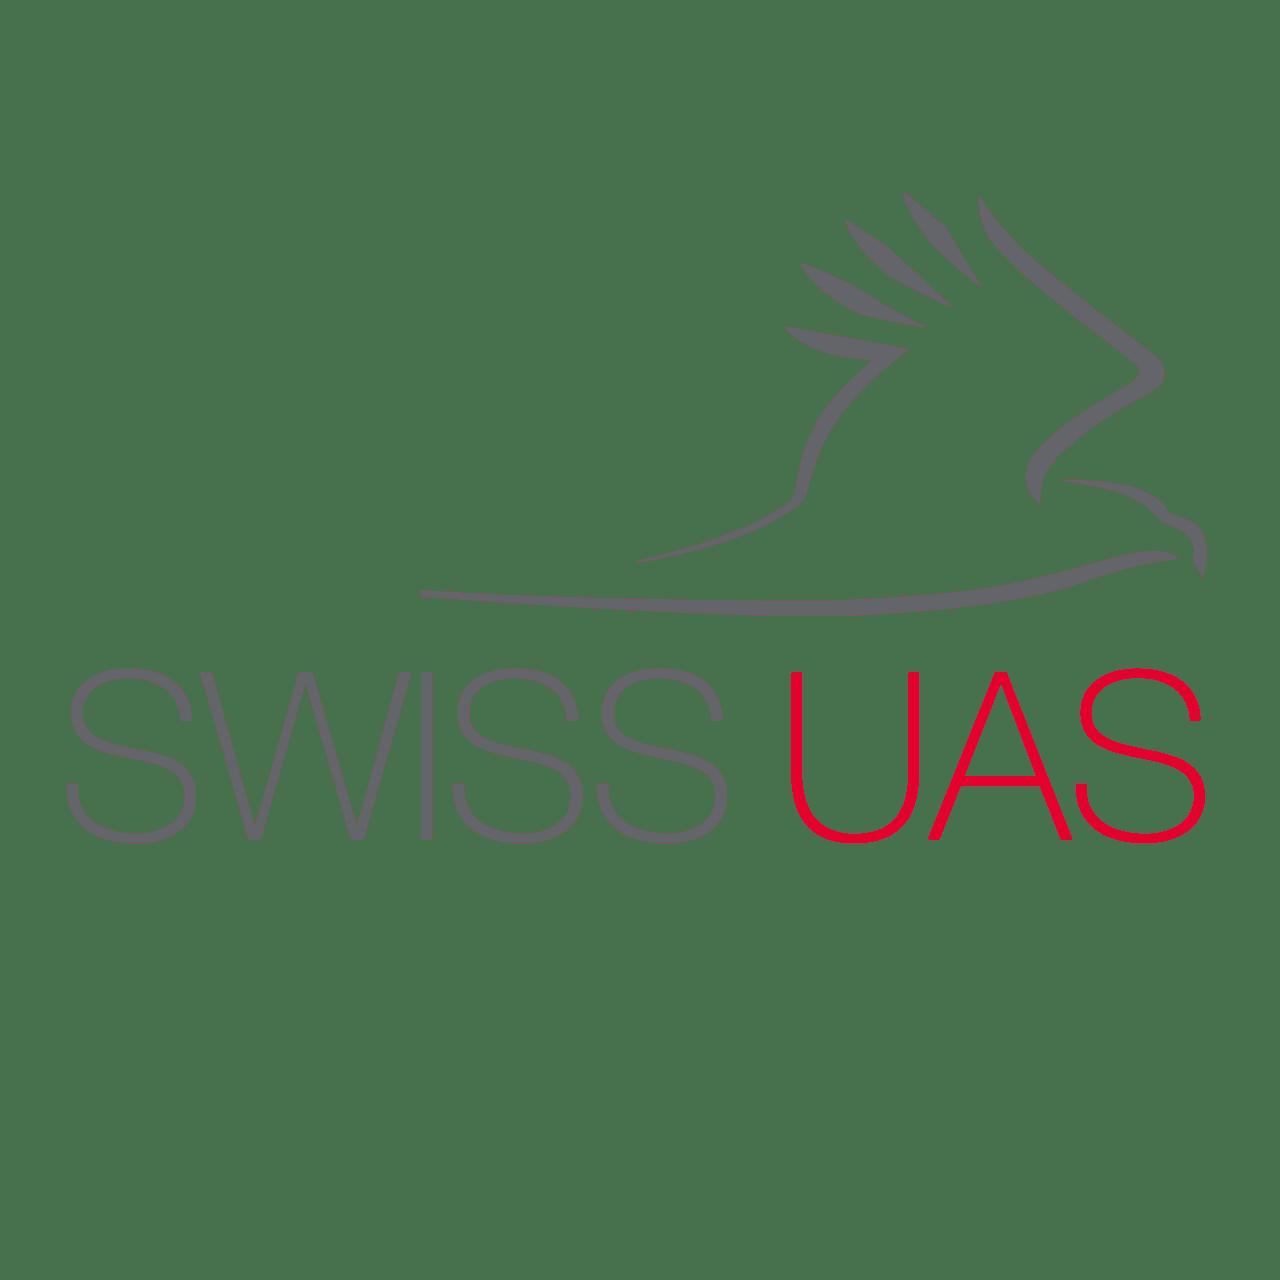 Logo Swiss UAS